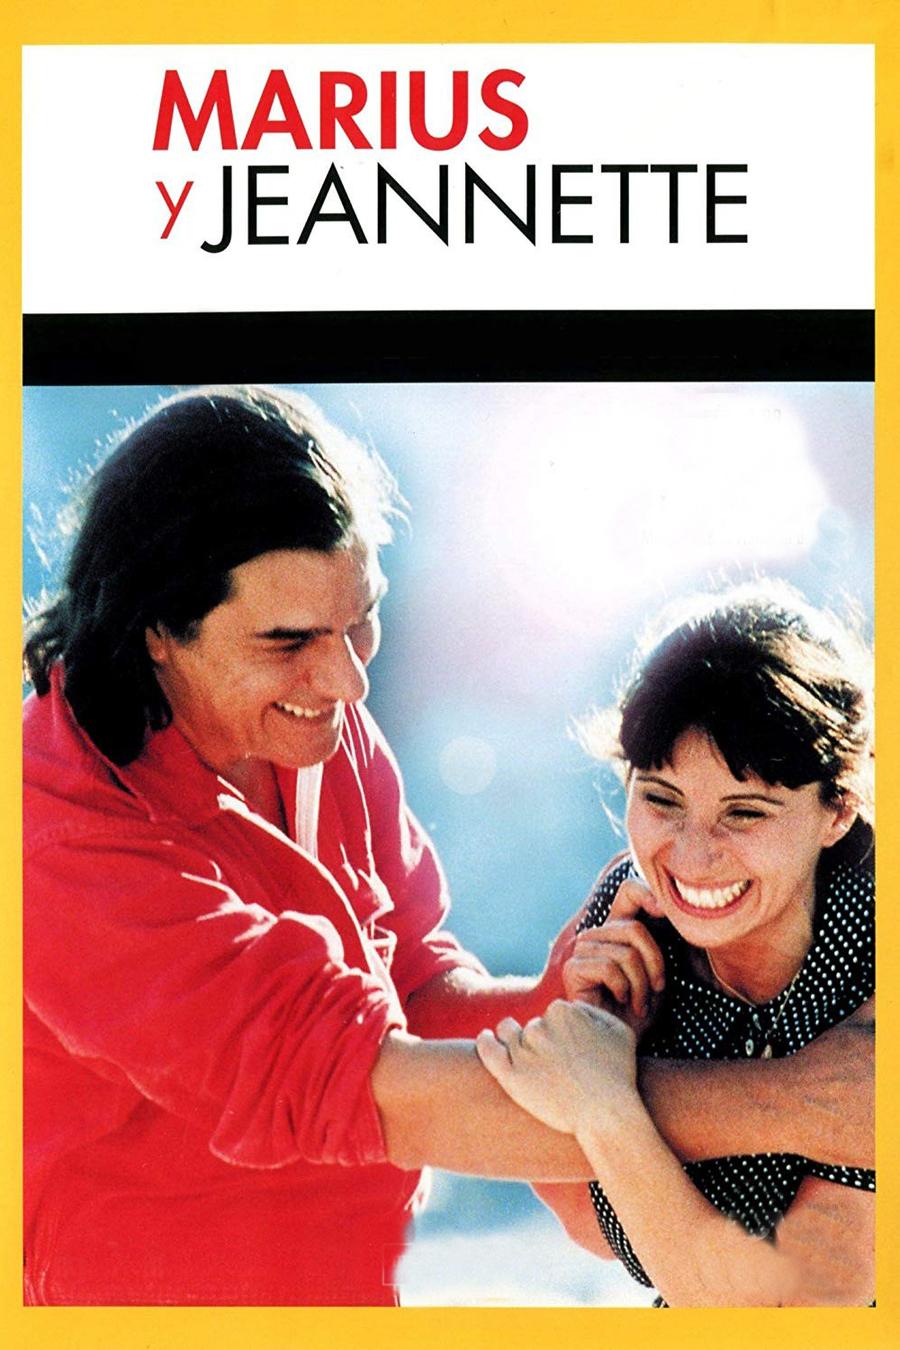 Marius y Jeannette